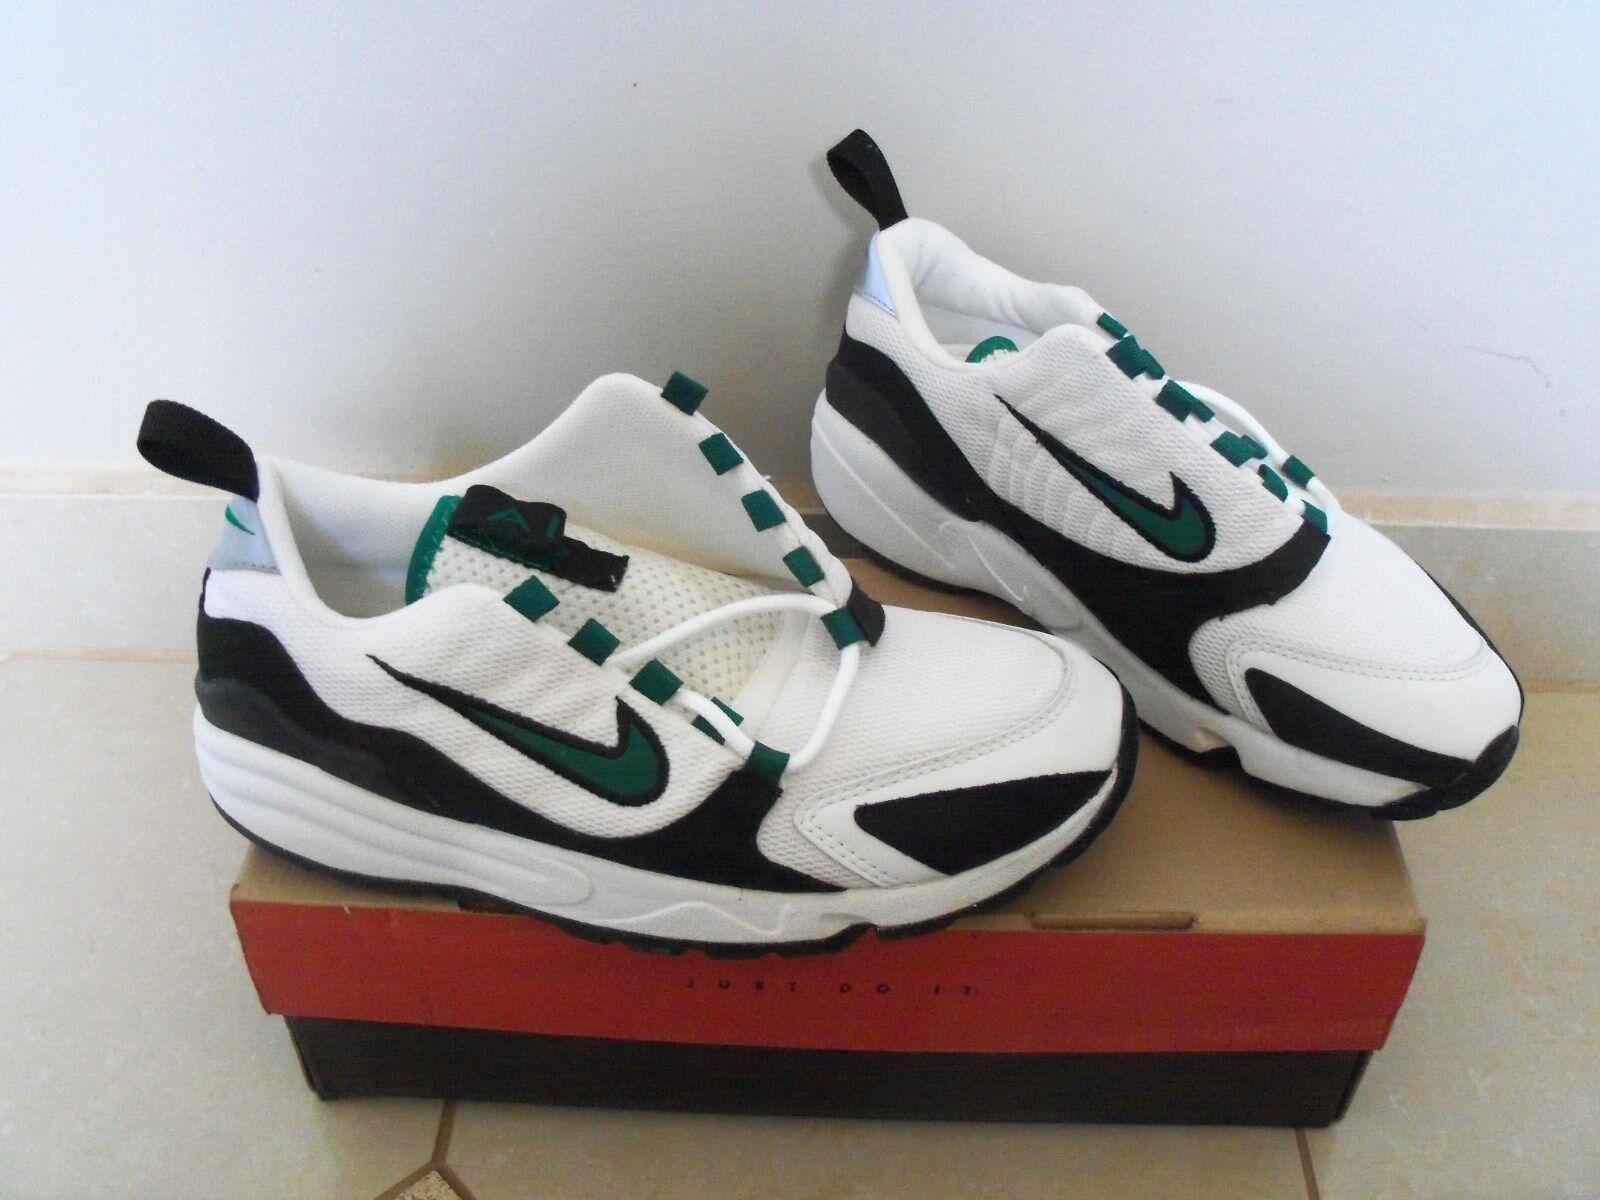 1996 og nike air stasi fs molto raro di scarpe vintage new sz: 8 cosa verde / nero